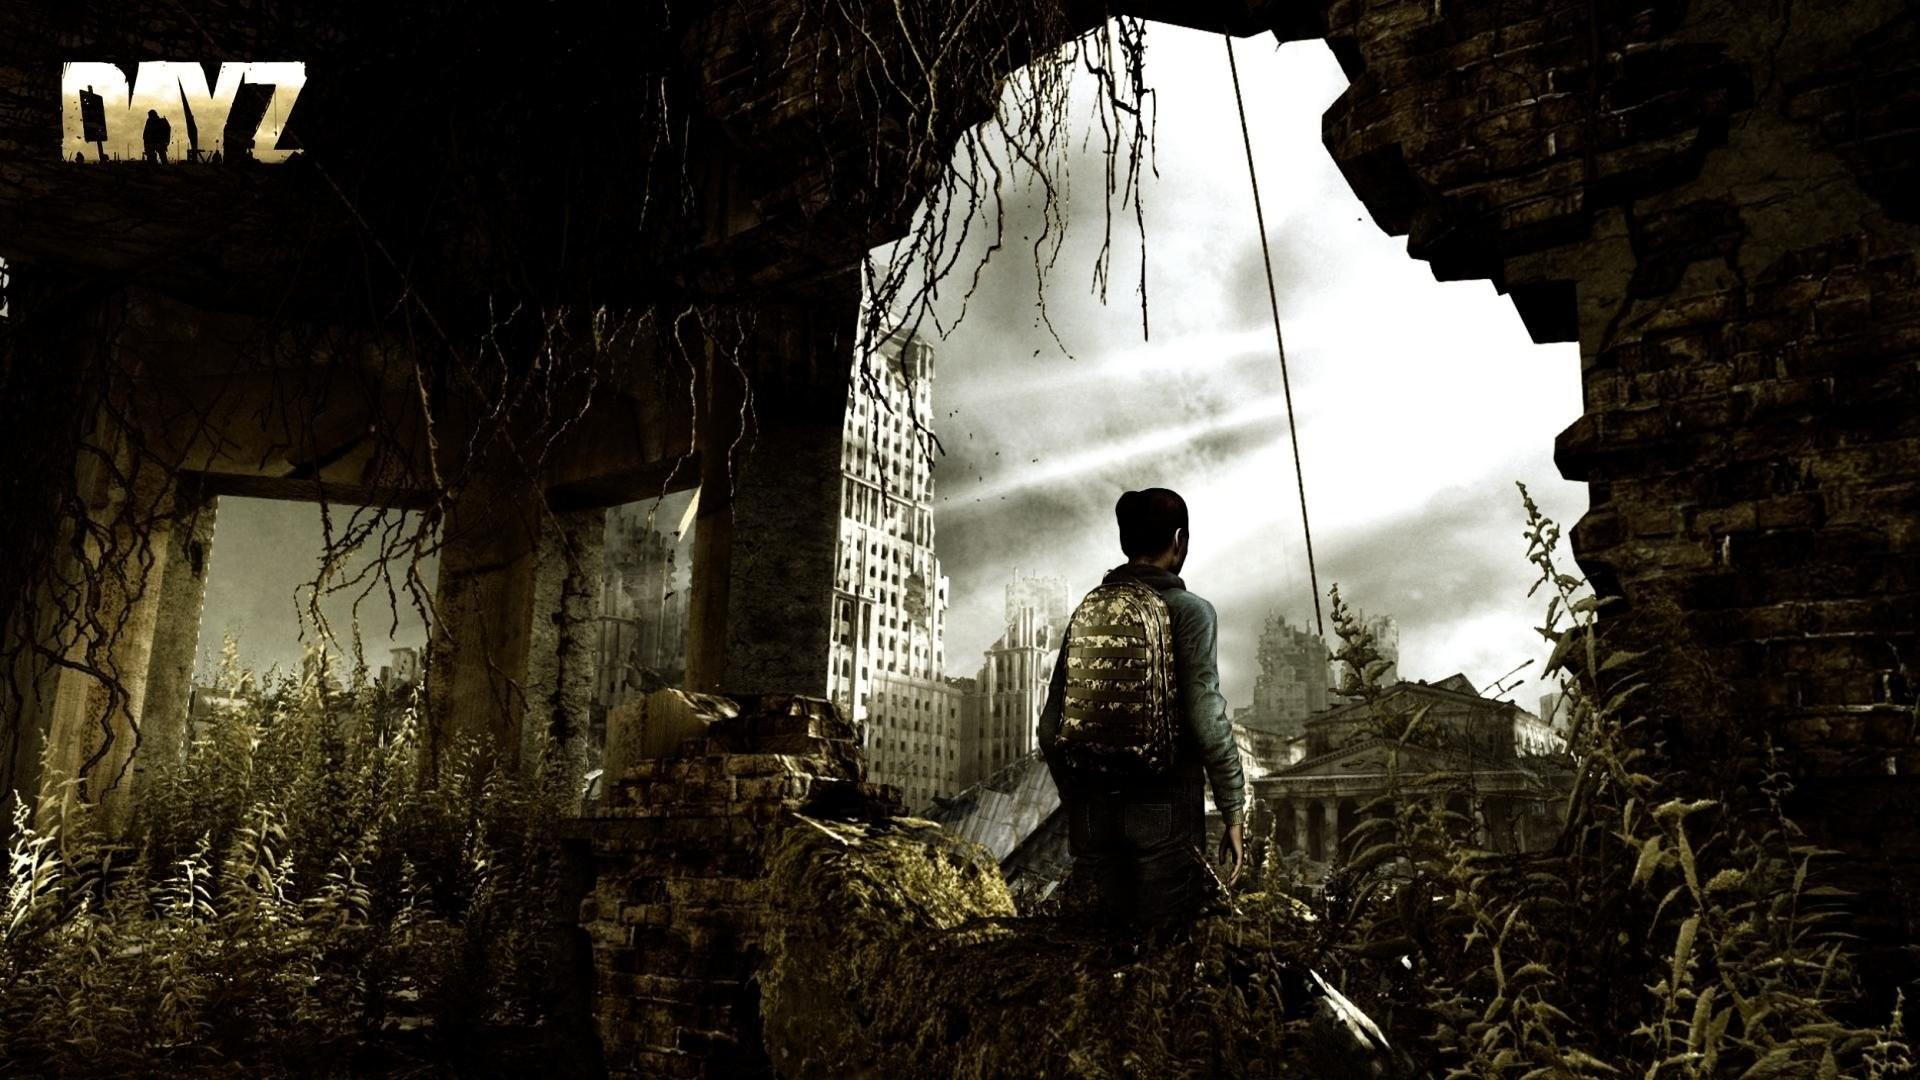 DAYZ survival horror zombie apocalyptic wallpaper | | 510417 |  WallpaperUP